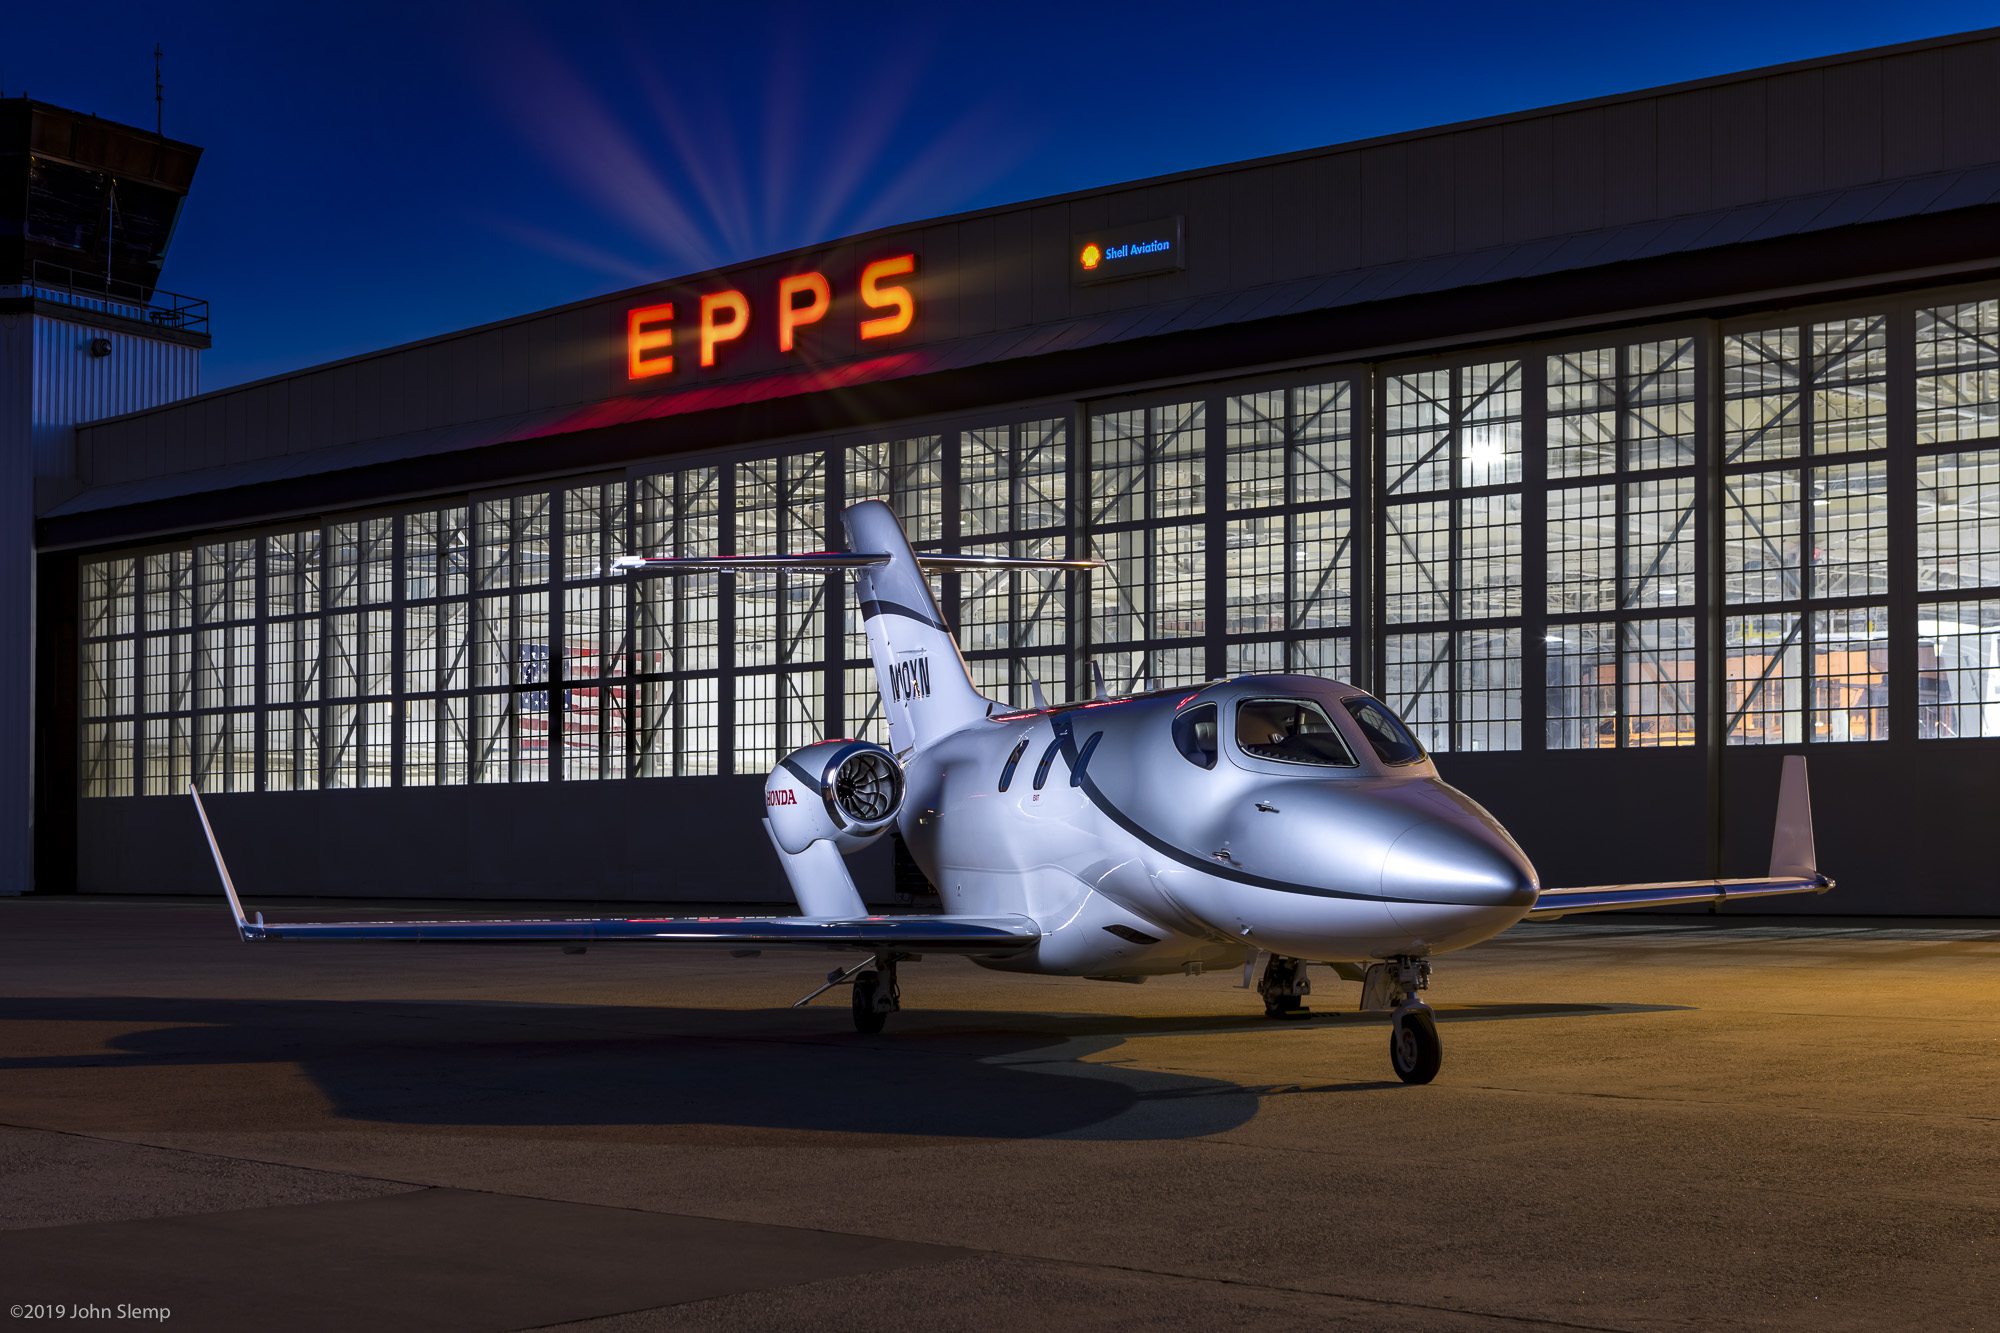 HondaJet photographed recently at Dekalb Peachtree Airport here in Atlanta. ©2019 John Slemp